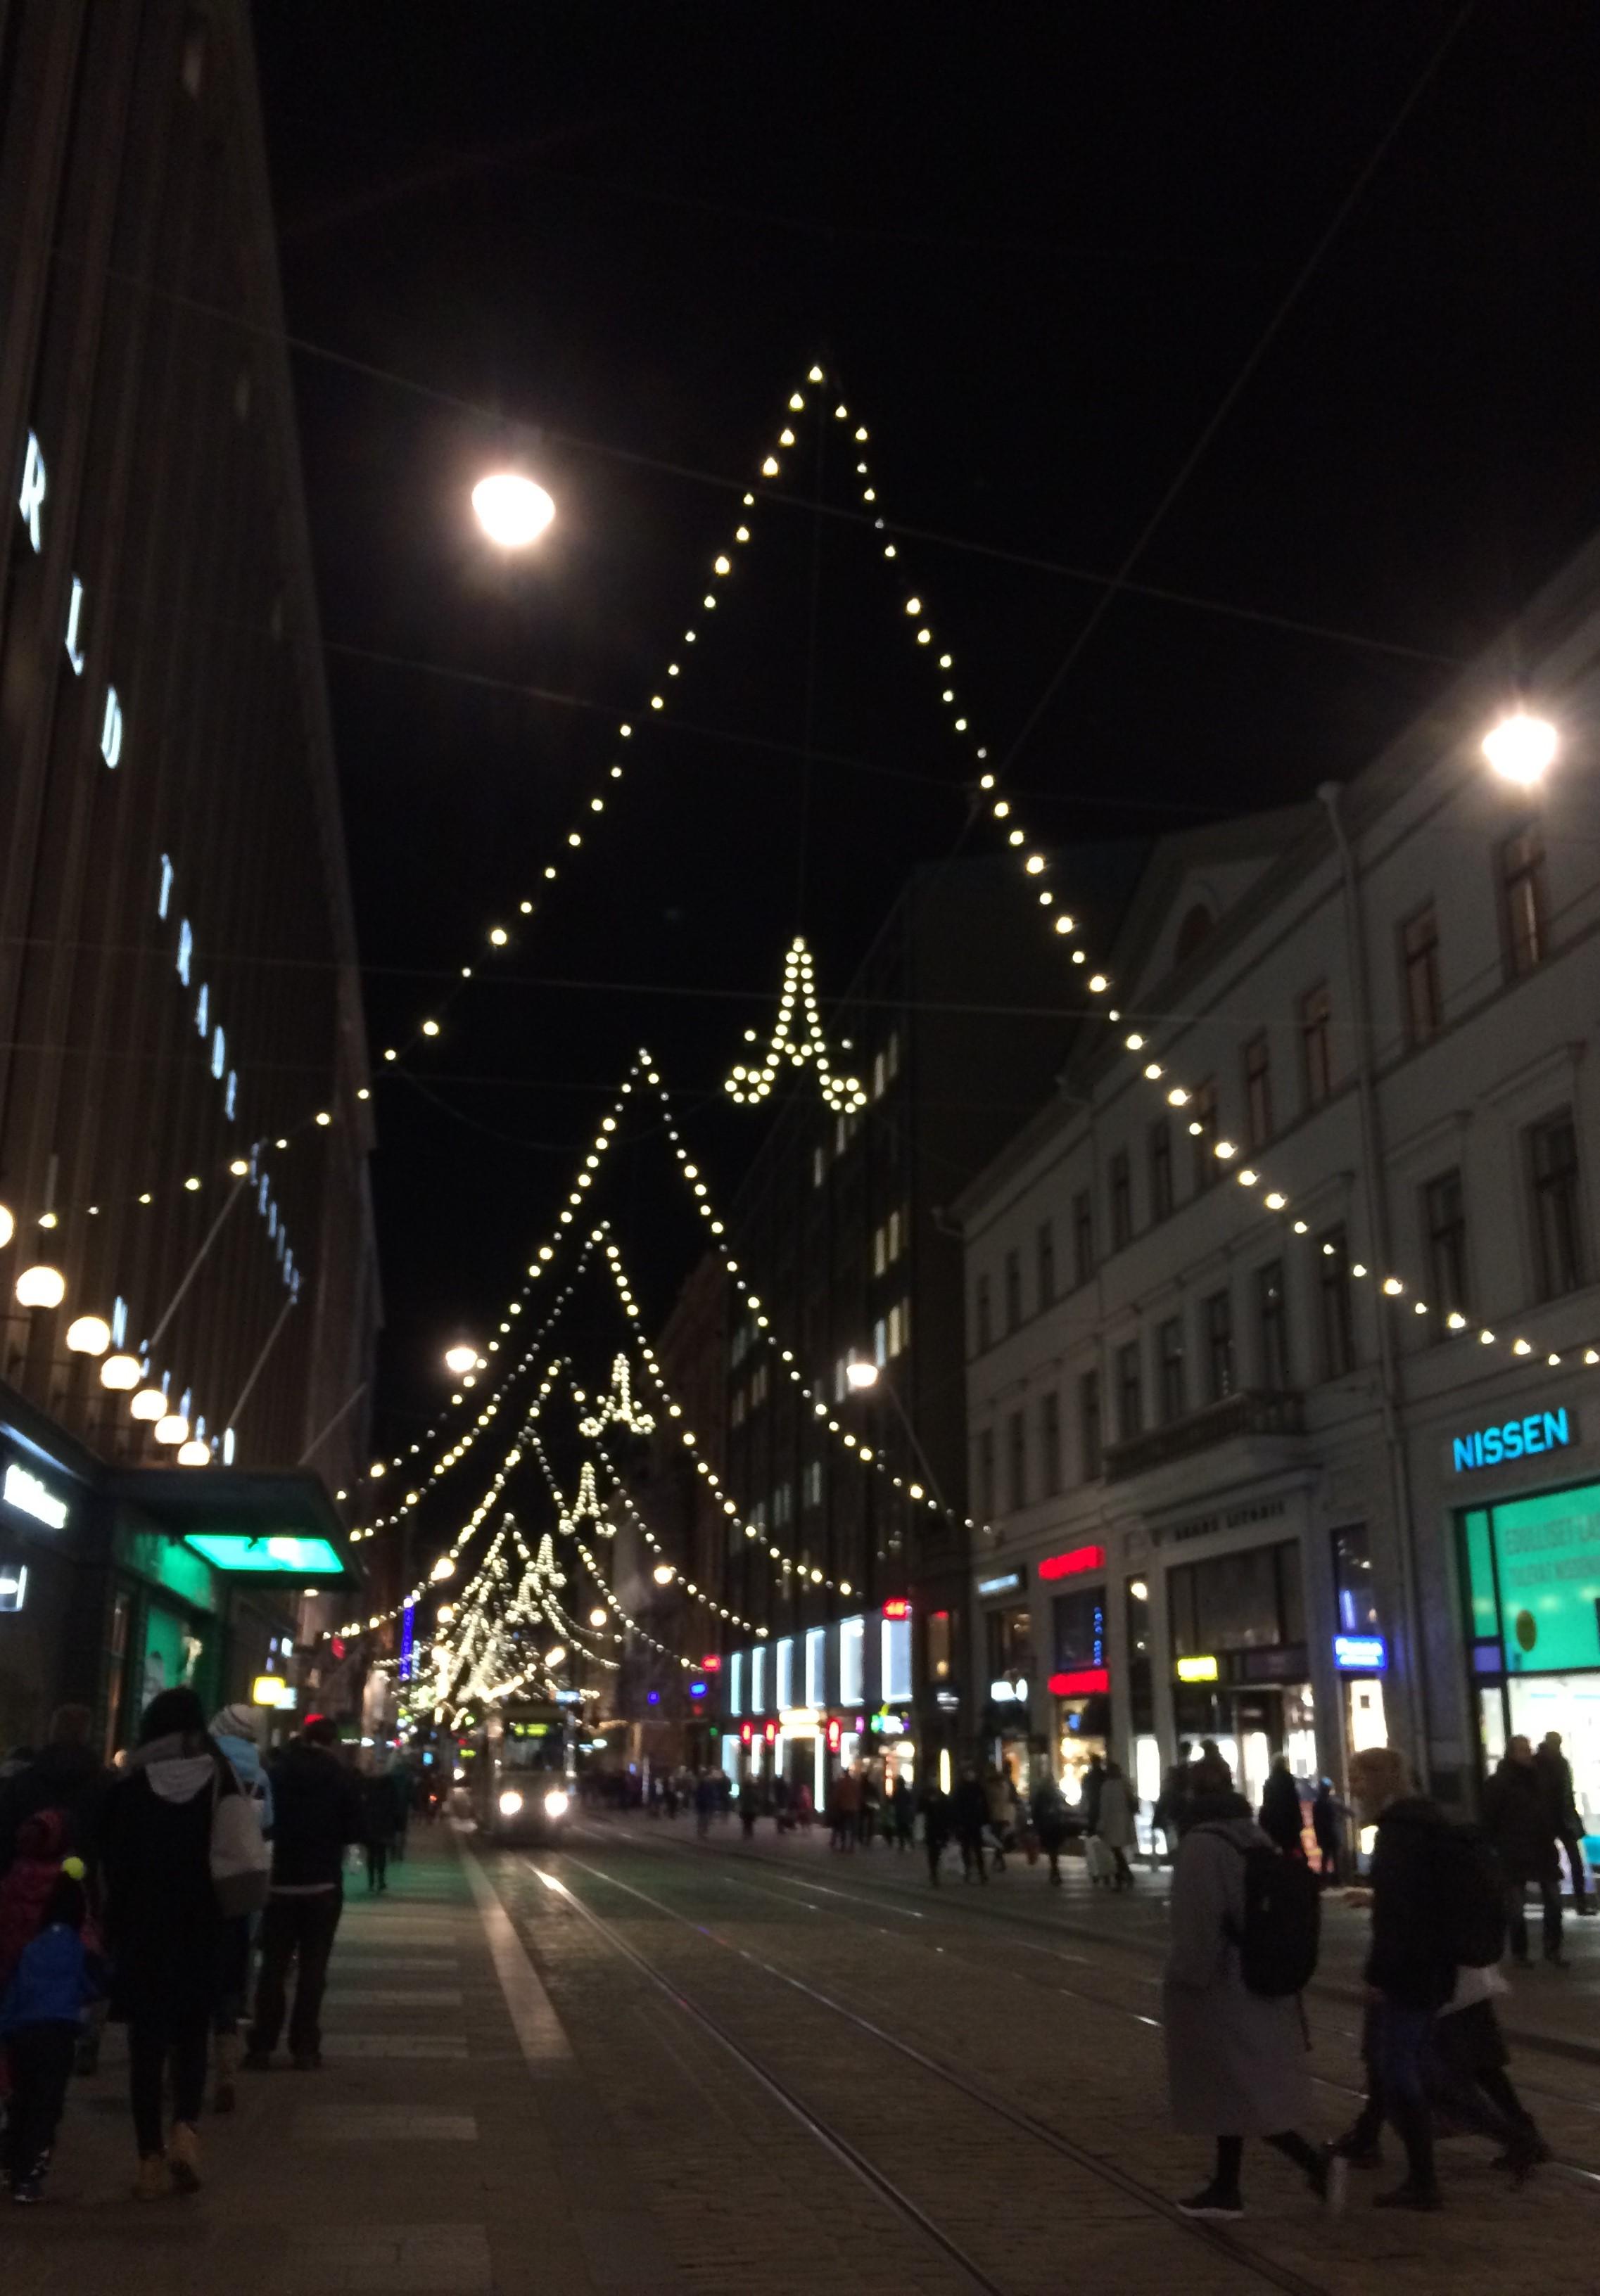 002 Helsinki Christmas Lights